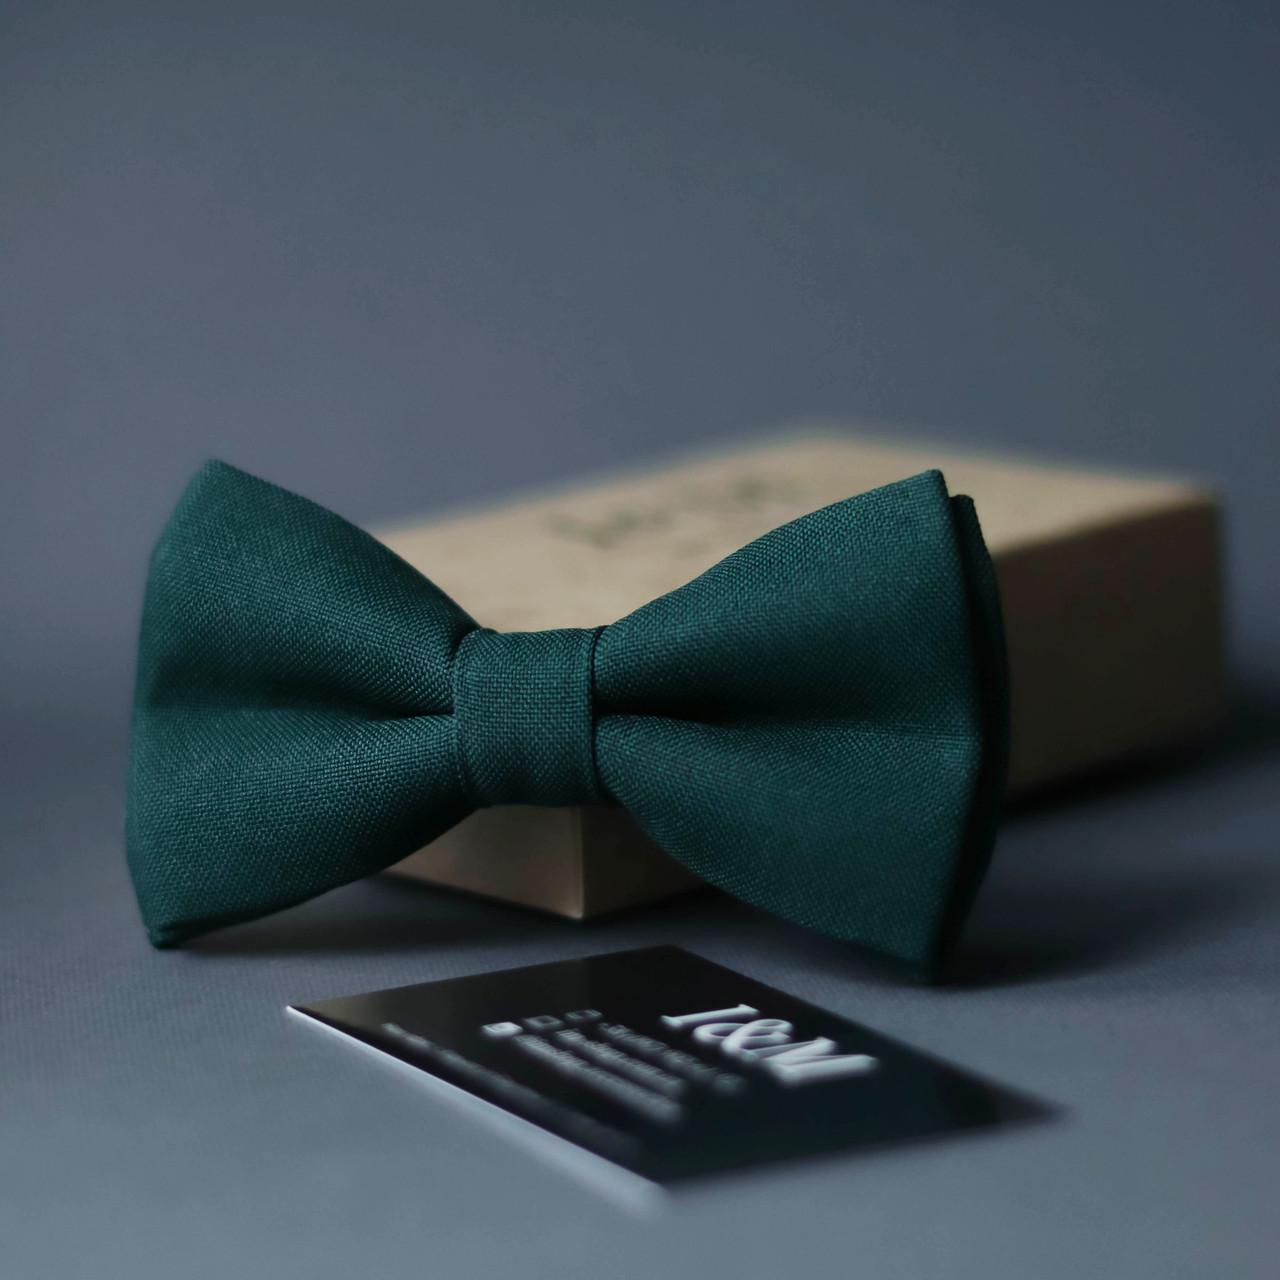 Галстук-бабочка I&M Craft классический темно-зеленый (010319)